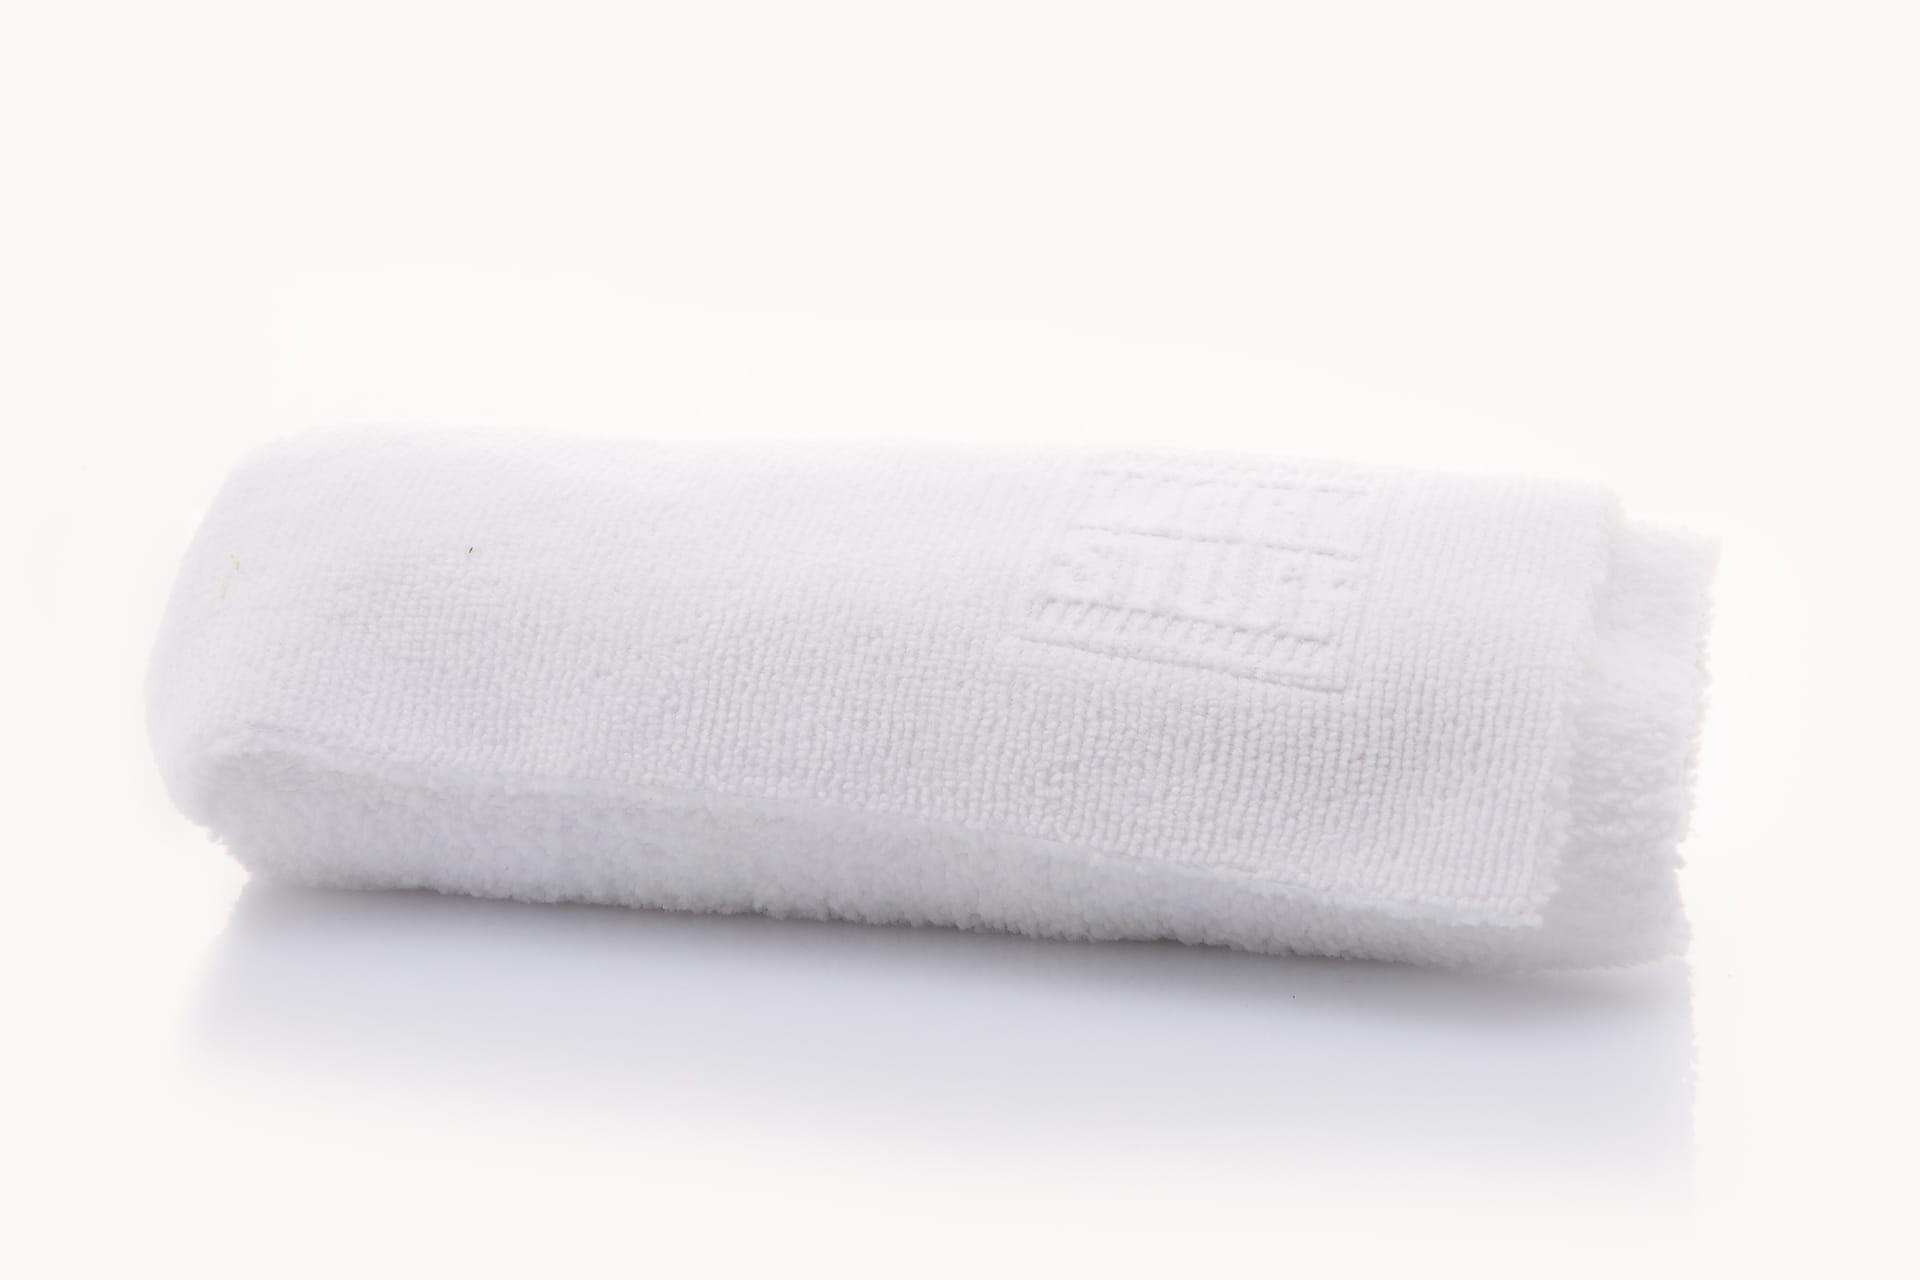 Work Stuff Basic White - delikatna mikrofibra